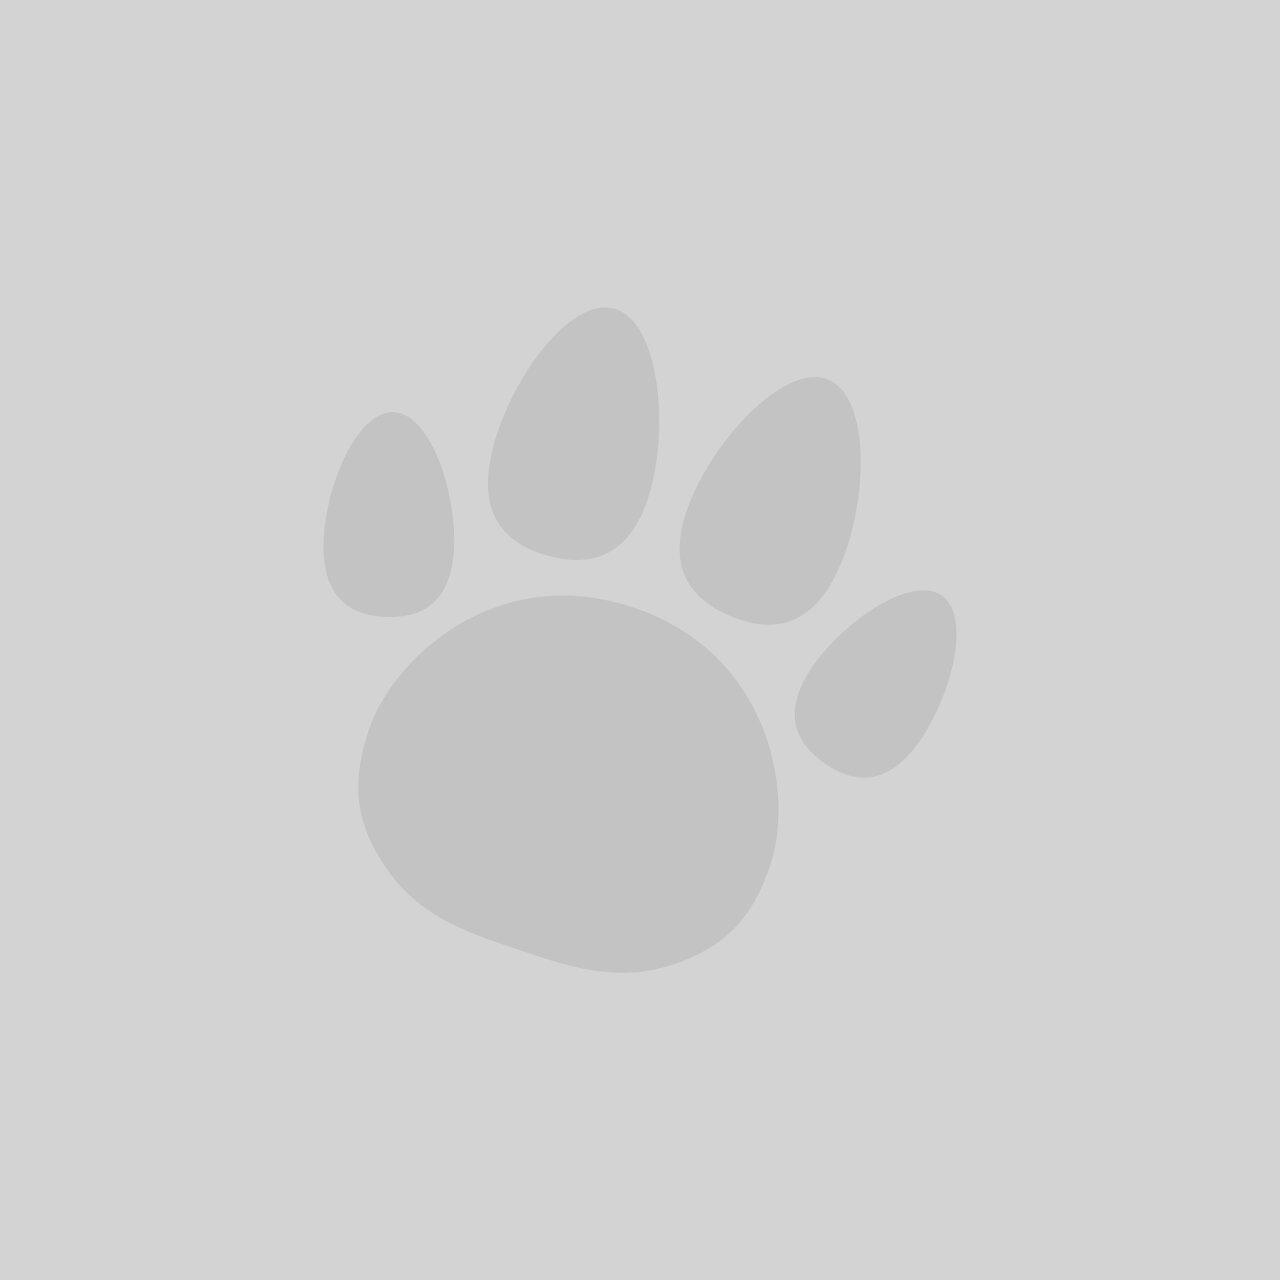 eb7aa5380 Habitrail OVO Suite Hamster Habitat